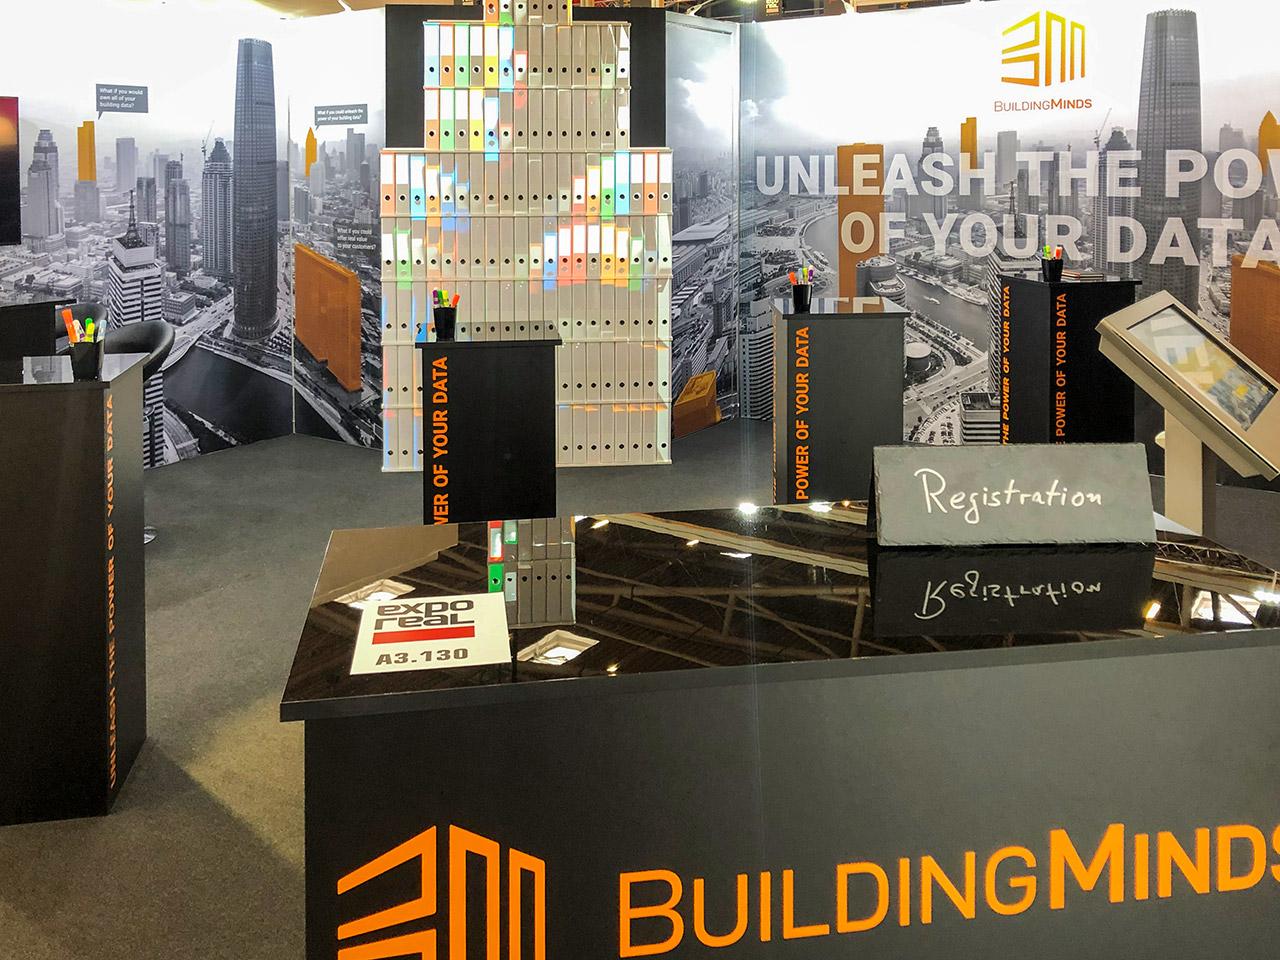 Messebau - Messestand Building Minds